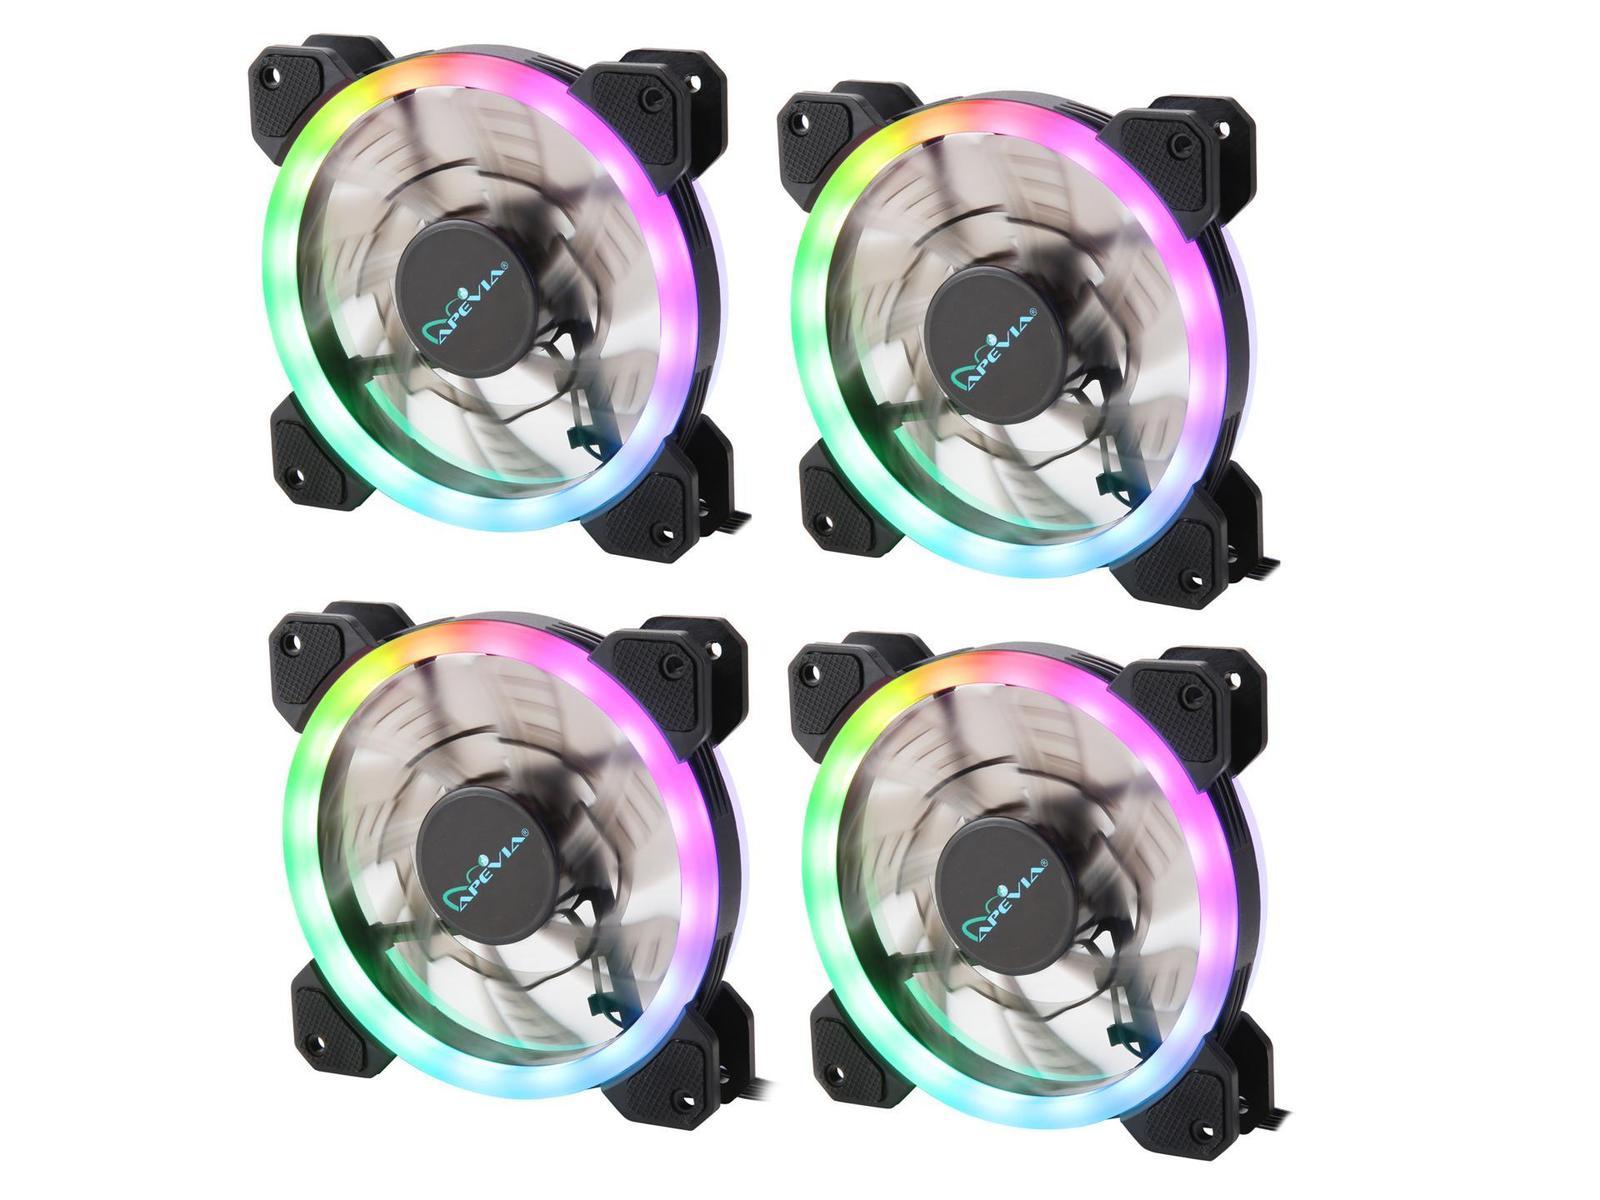 Apevia 412L-RGB Spectra 57.67 CFM 120 mm Fans 4-Pack